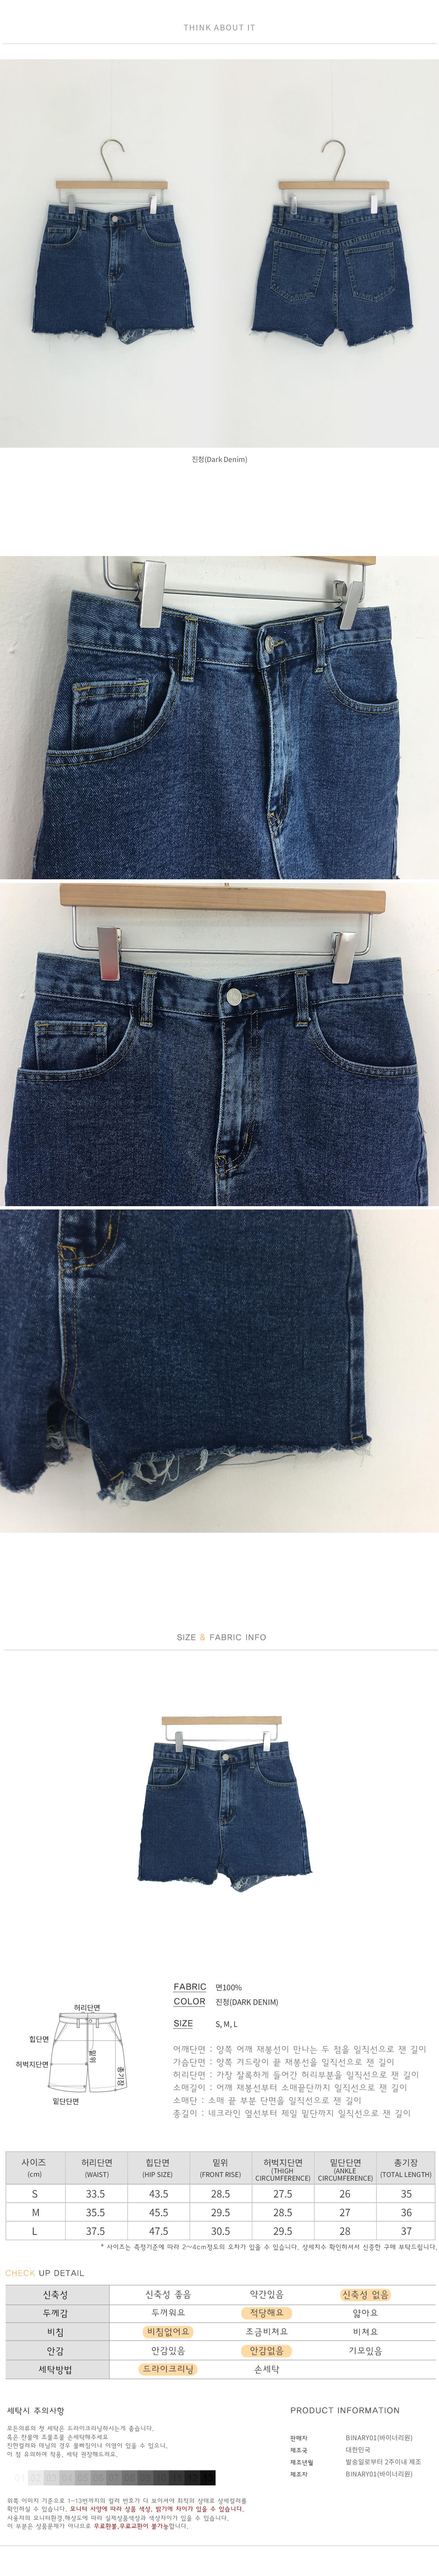 Cutting denim shorts Mali